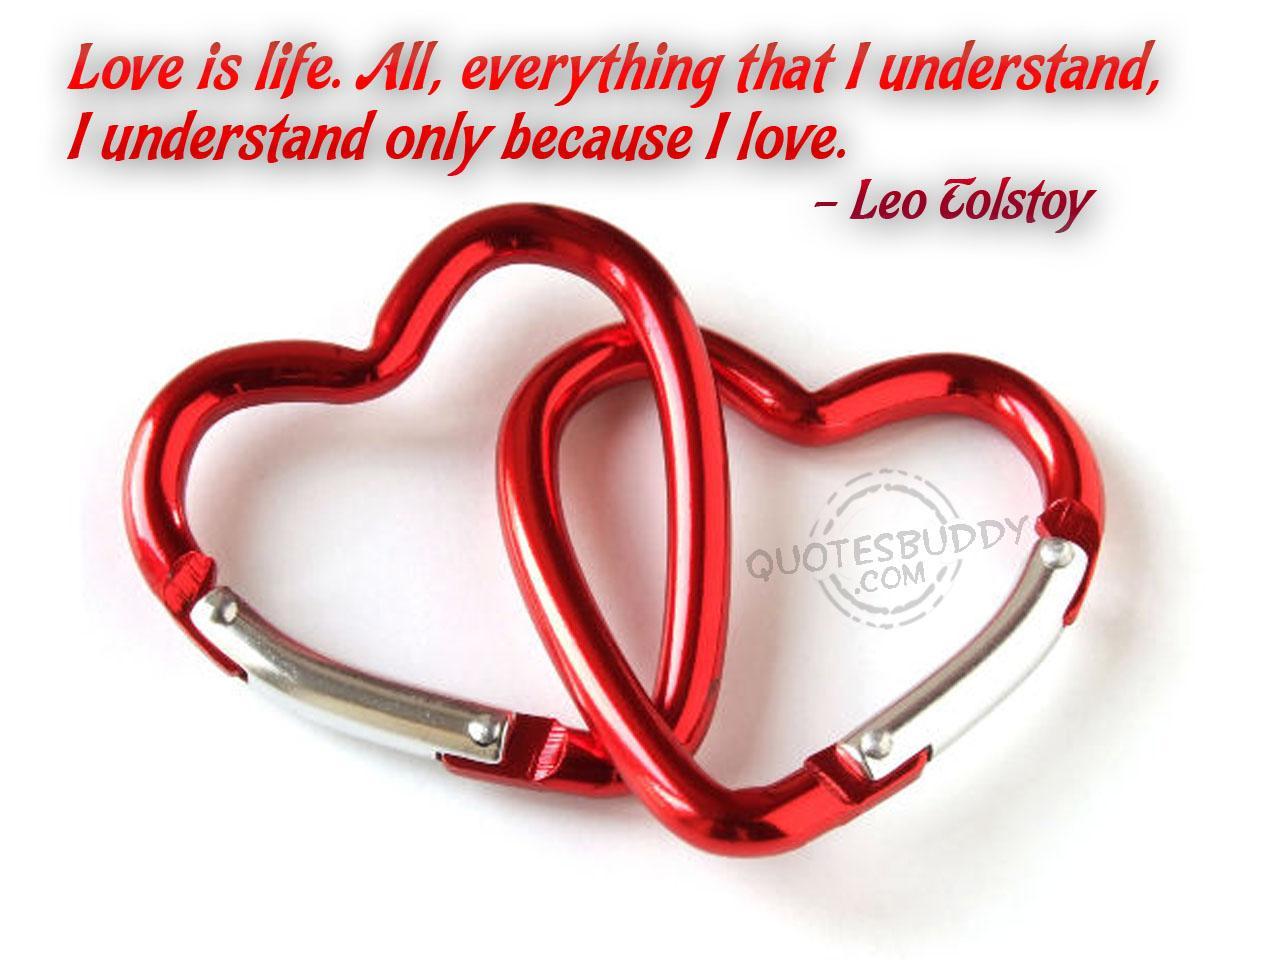 http://4.bp.blogspot.com/-OD5cjjWQUo0/TyfEsY5bV_I/AAAAAAAAI60/XkxdUk3nFGQ/s1600/love-Quotes-Graphics-411.jpg